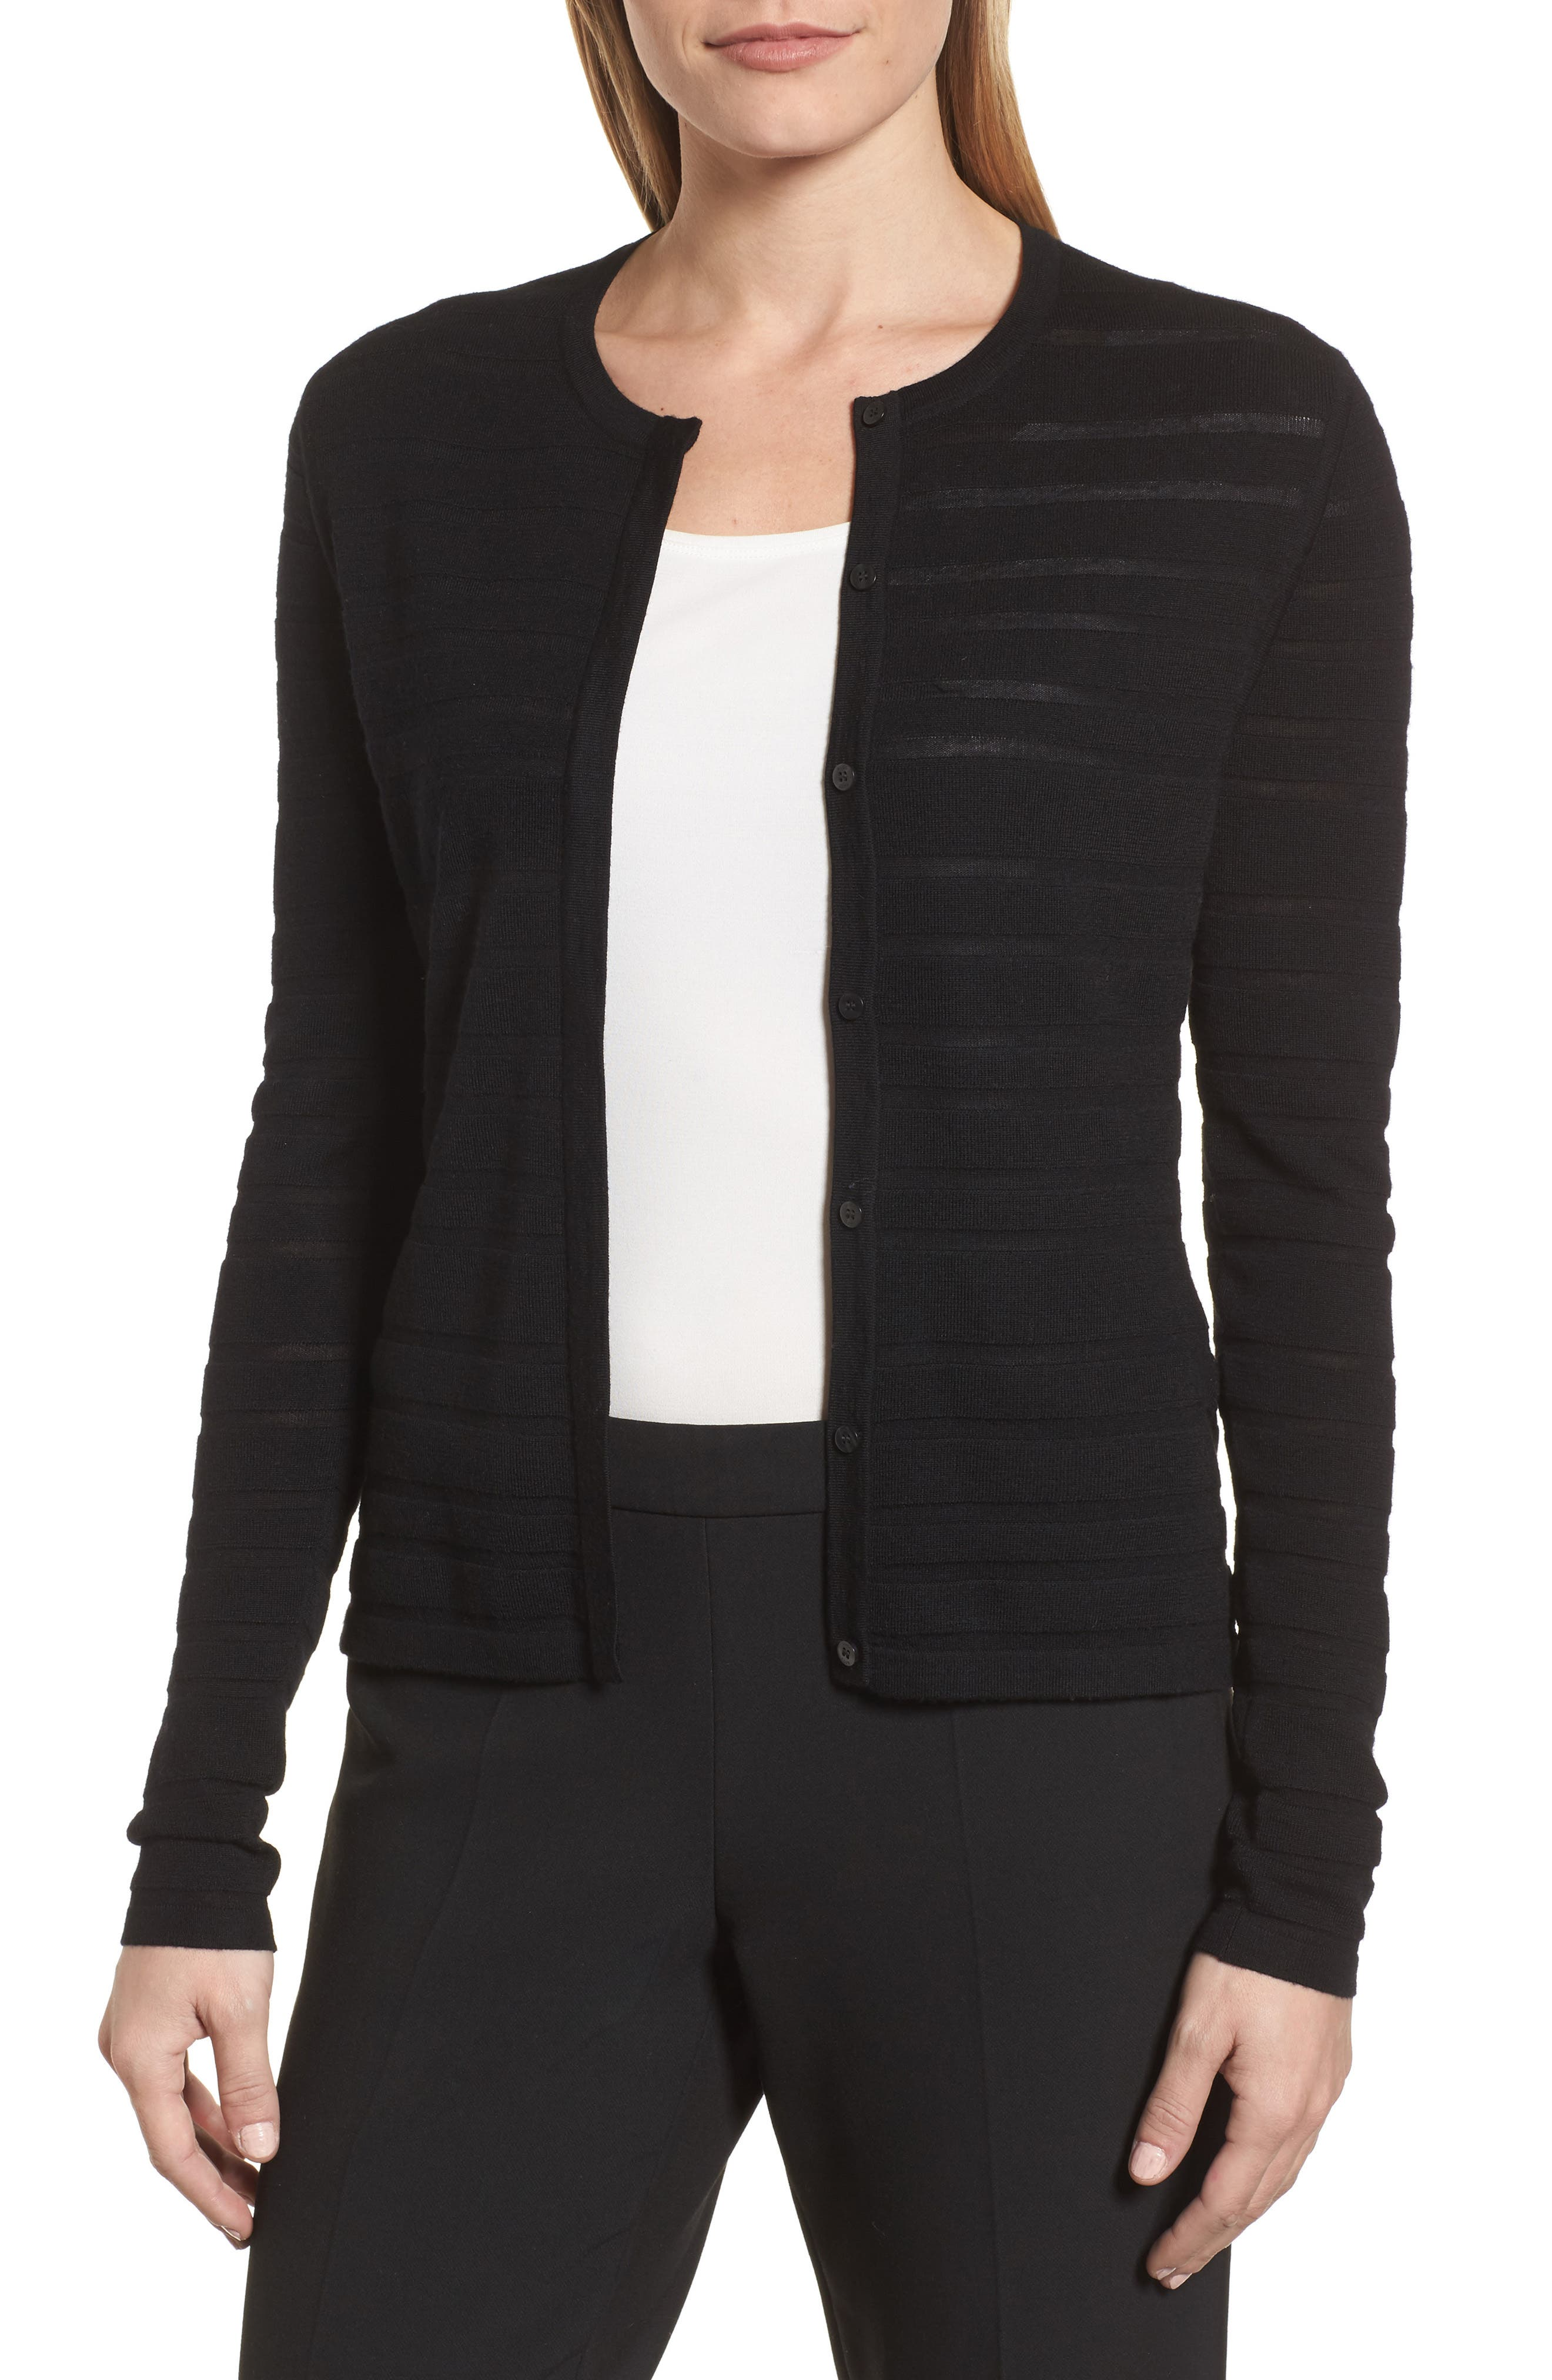 Fahsa Stripe Textured Wool Cardigan,                             Main thumbnail 1, color,                             Black